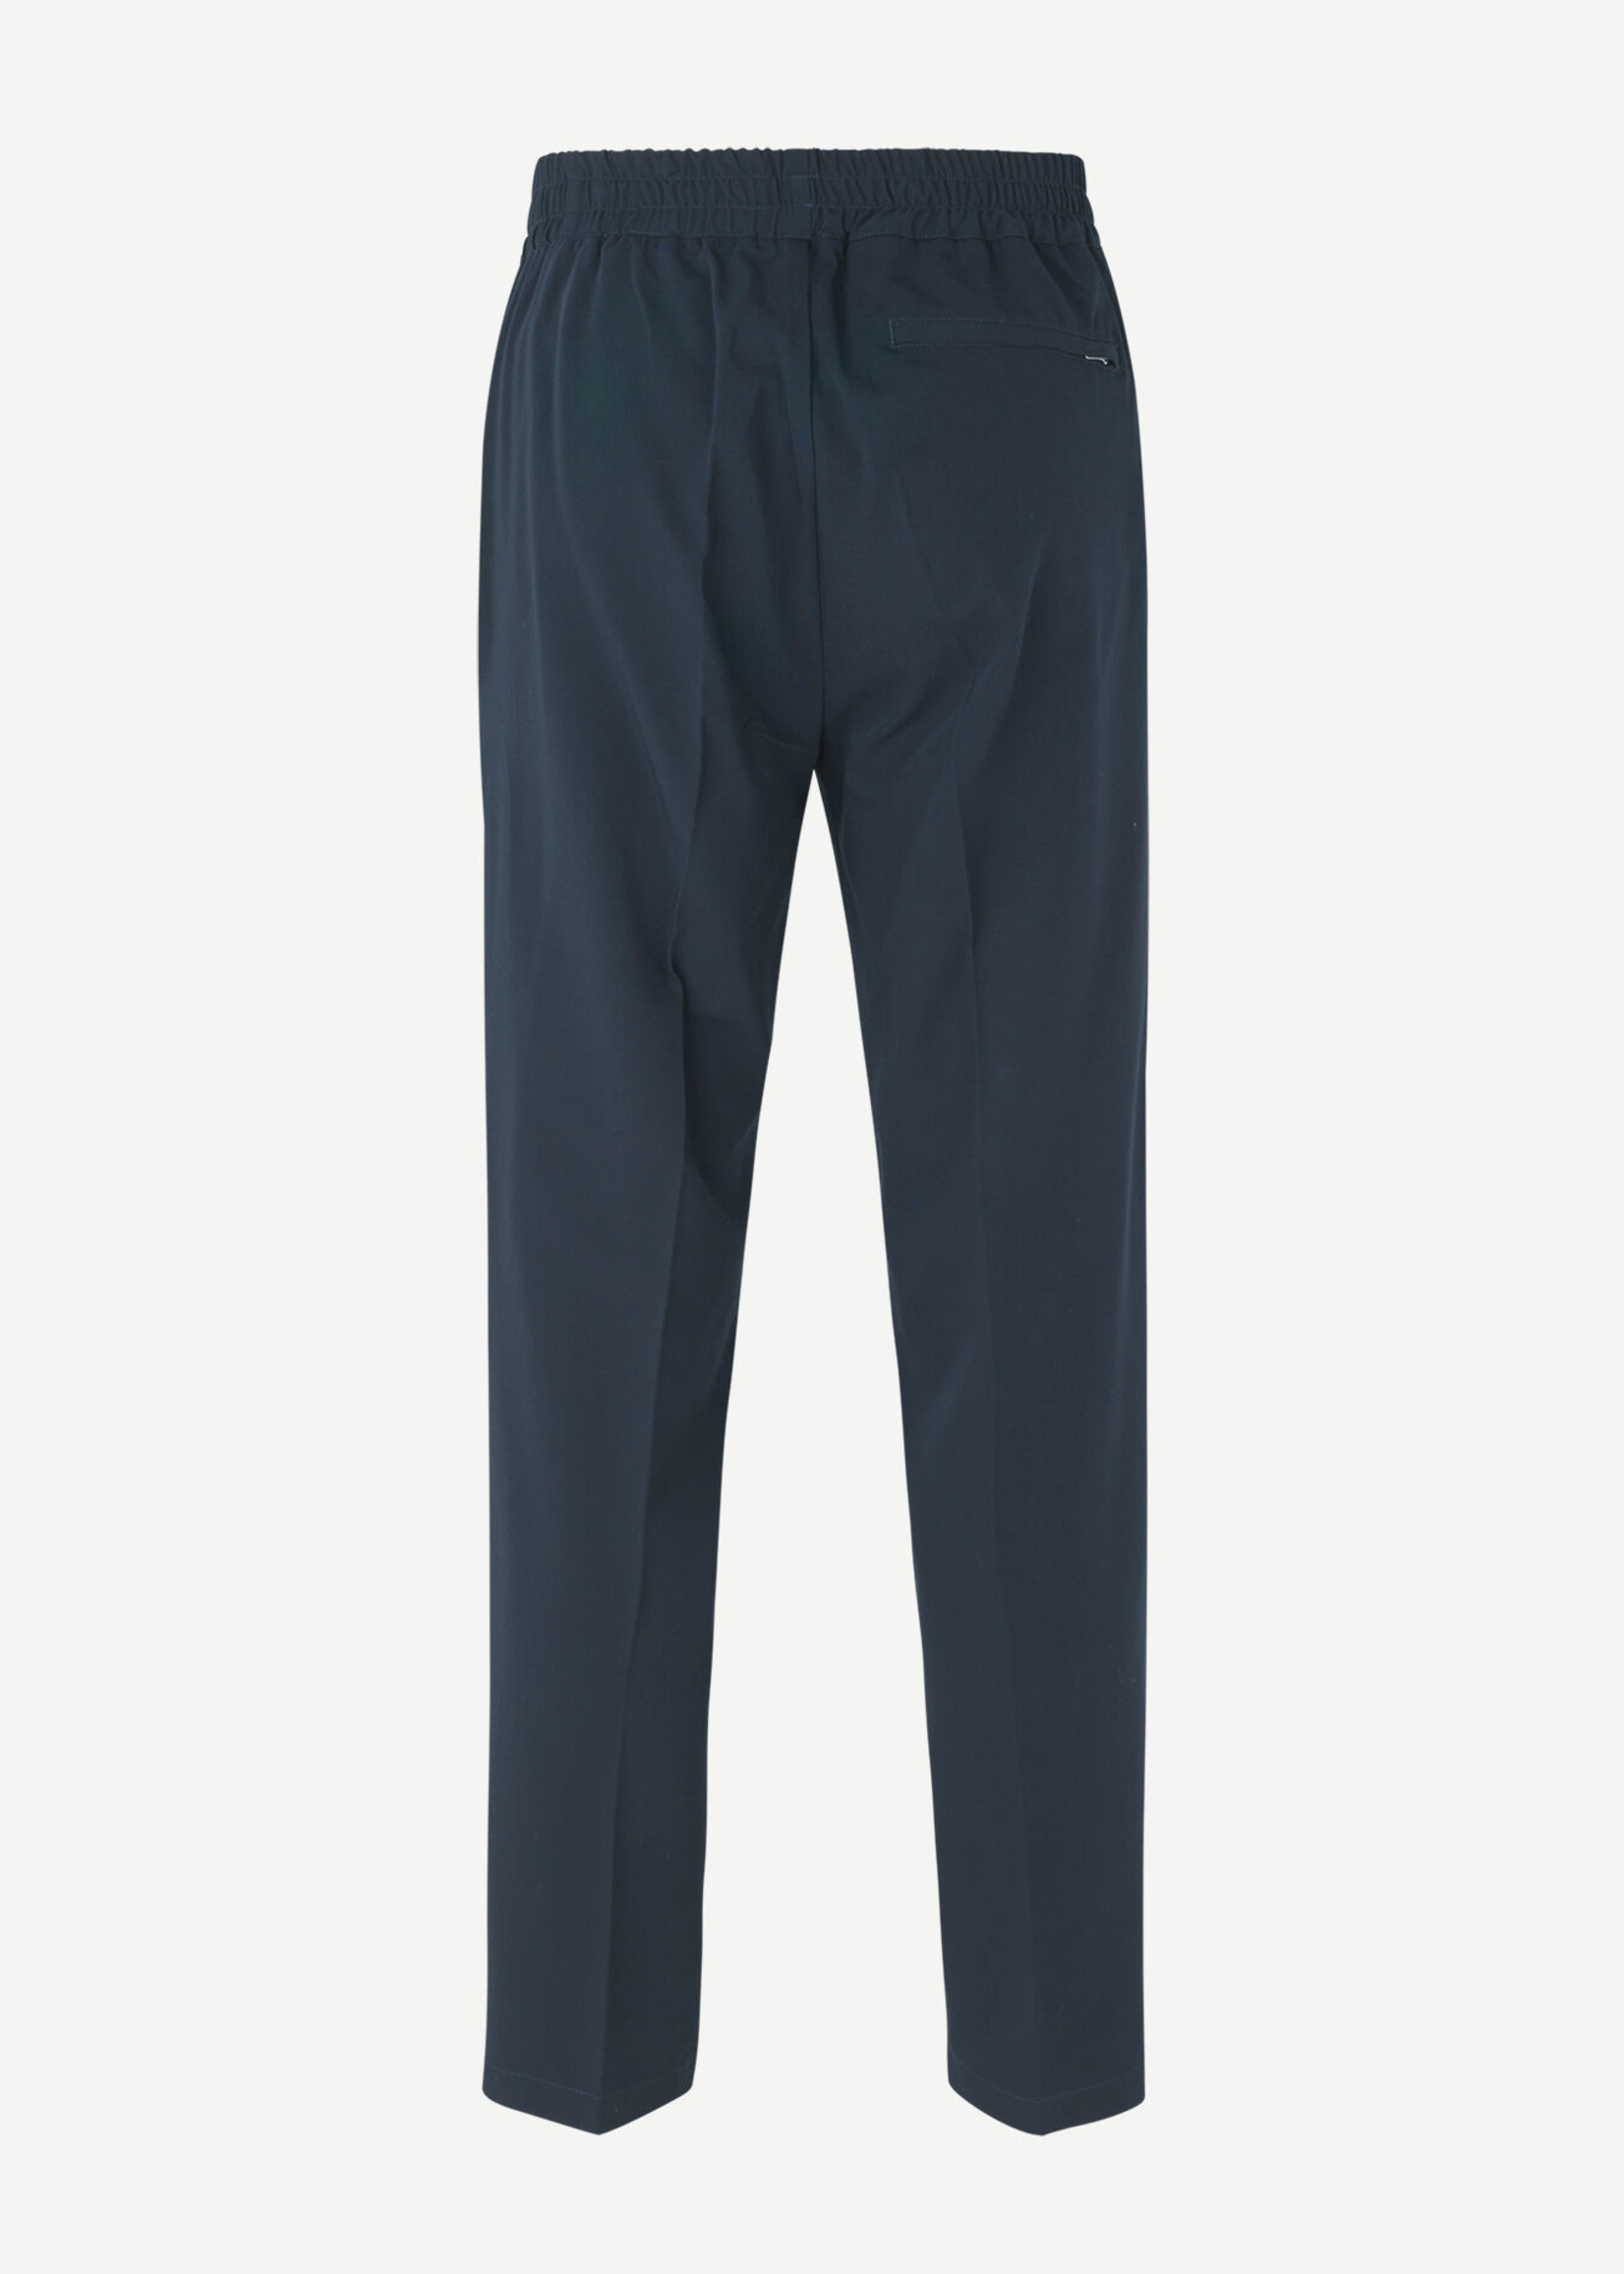 Samsoe & Samsoe Smithy Trouser 14090